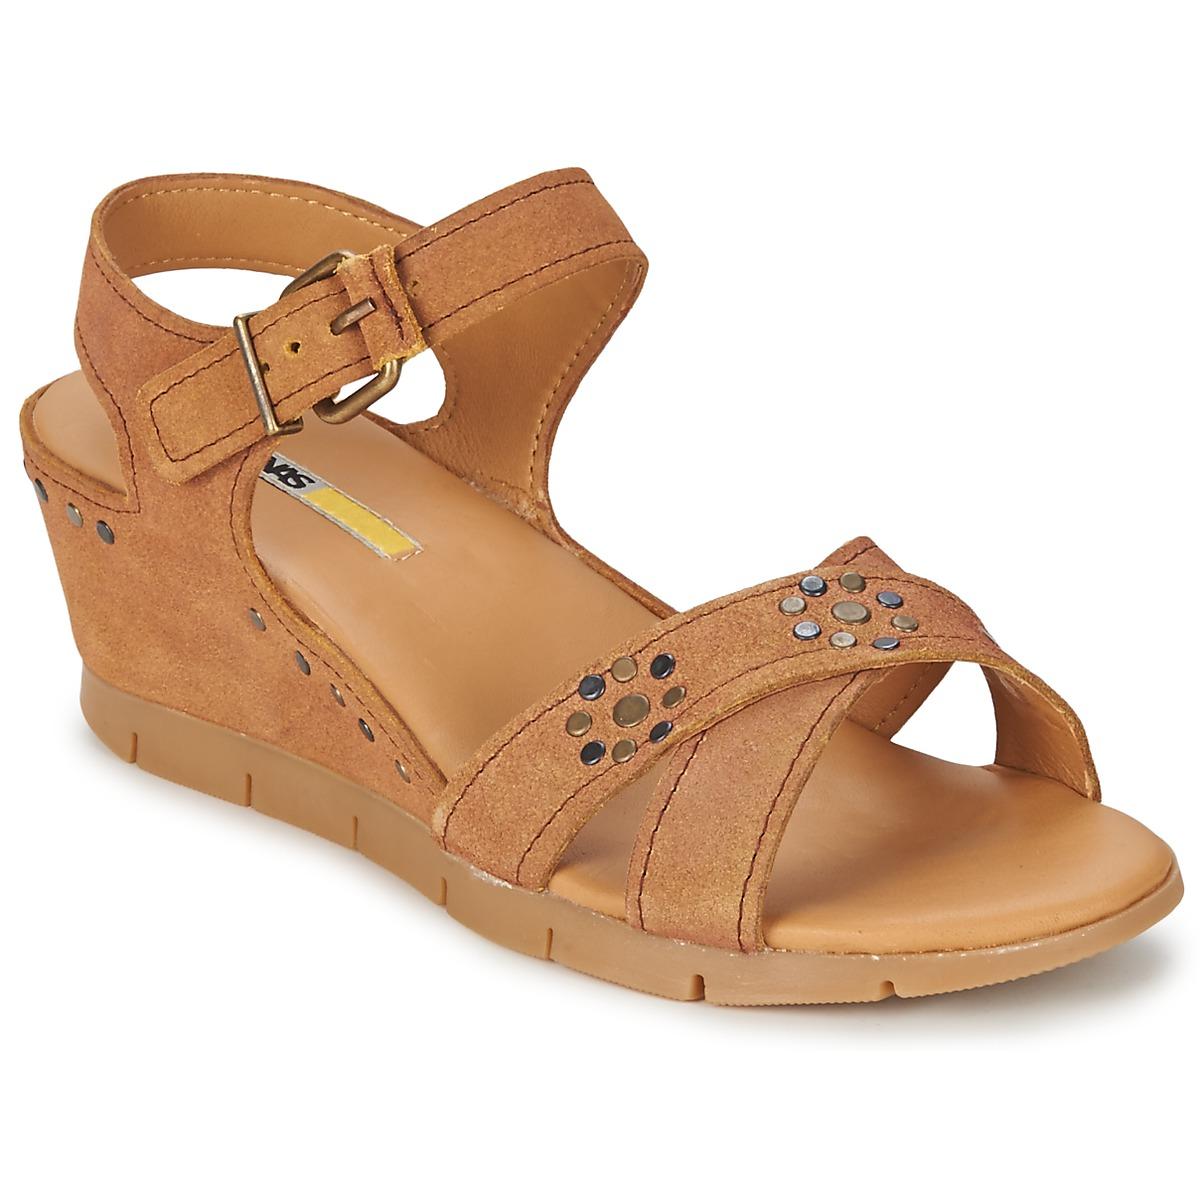 Sandale Manas  Camel